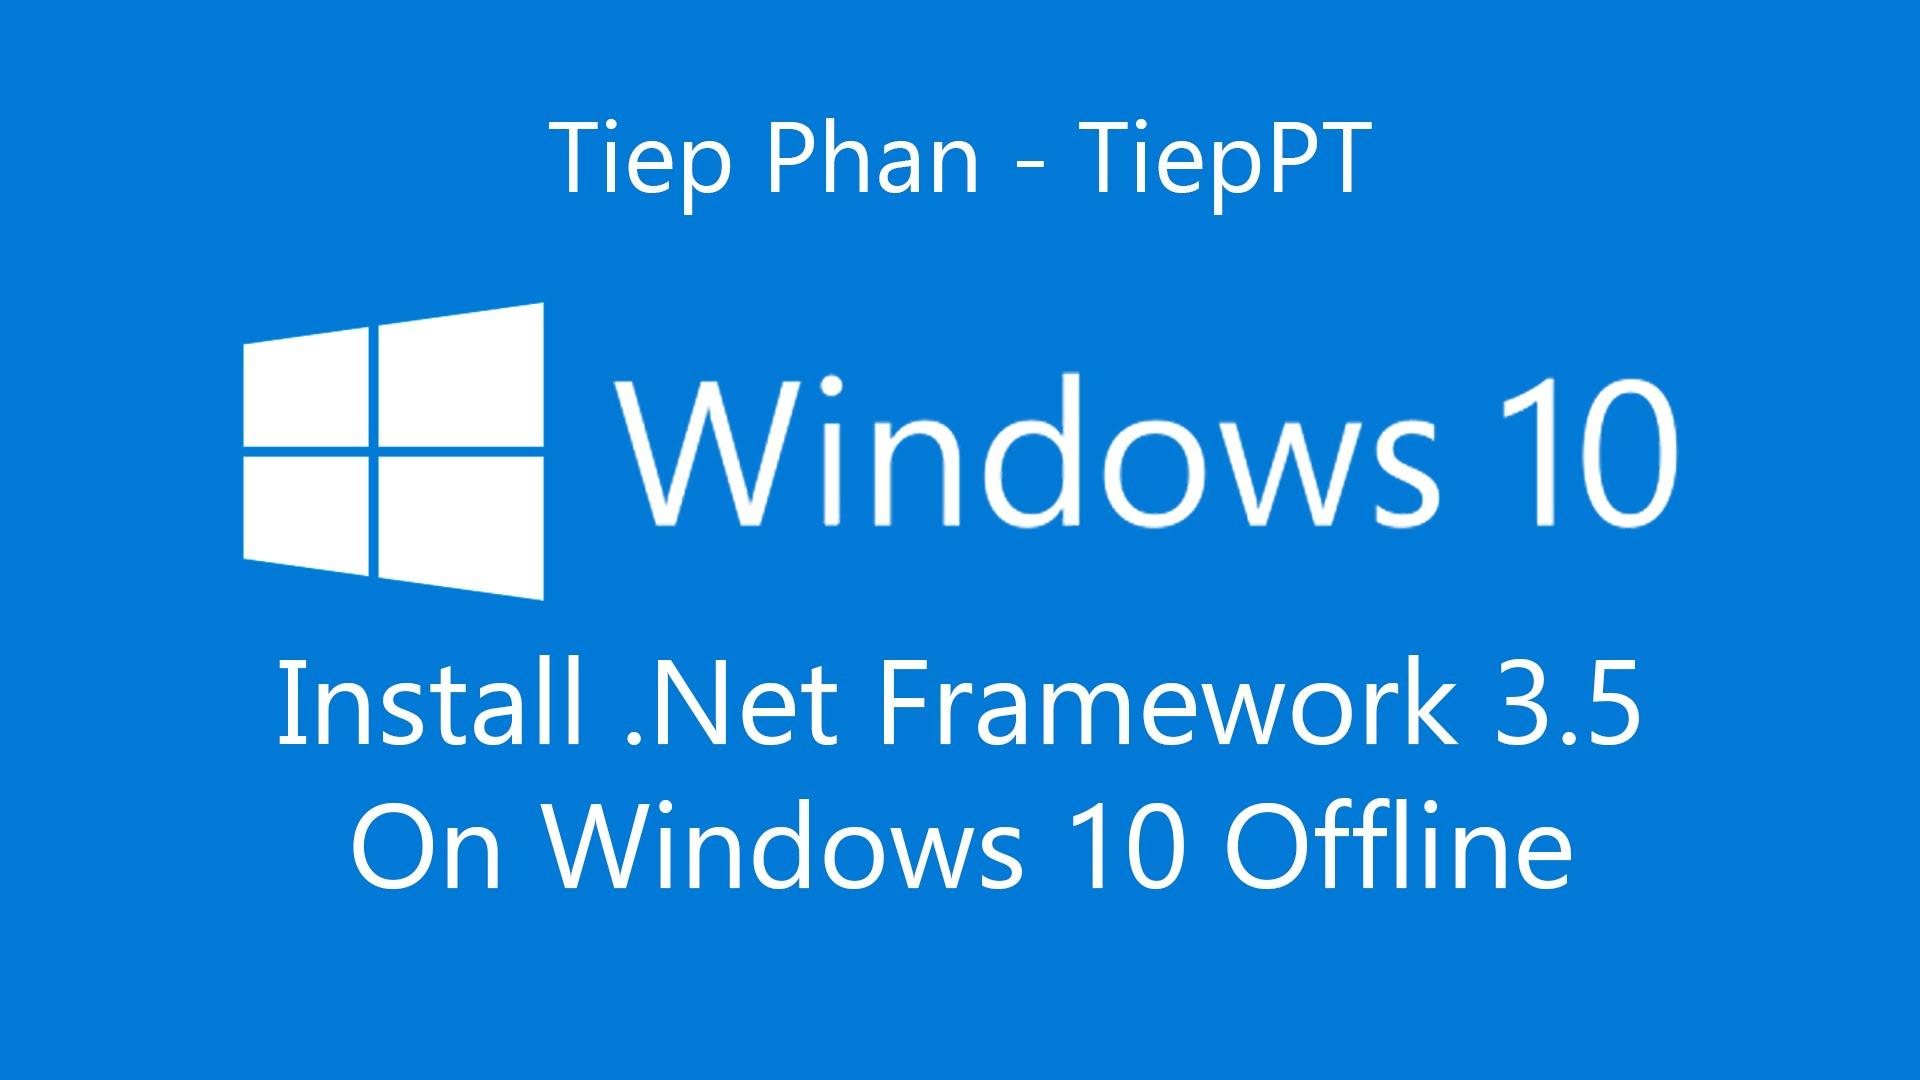 net framework in windows 10